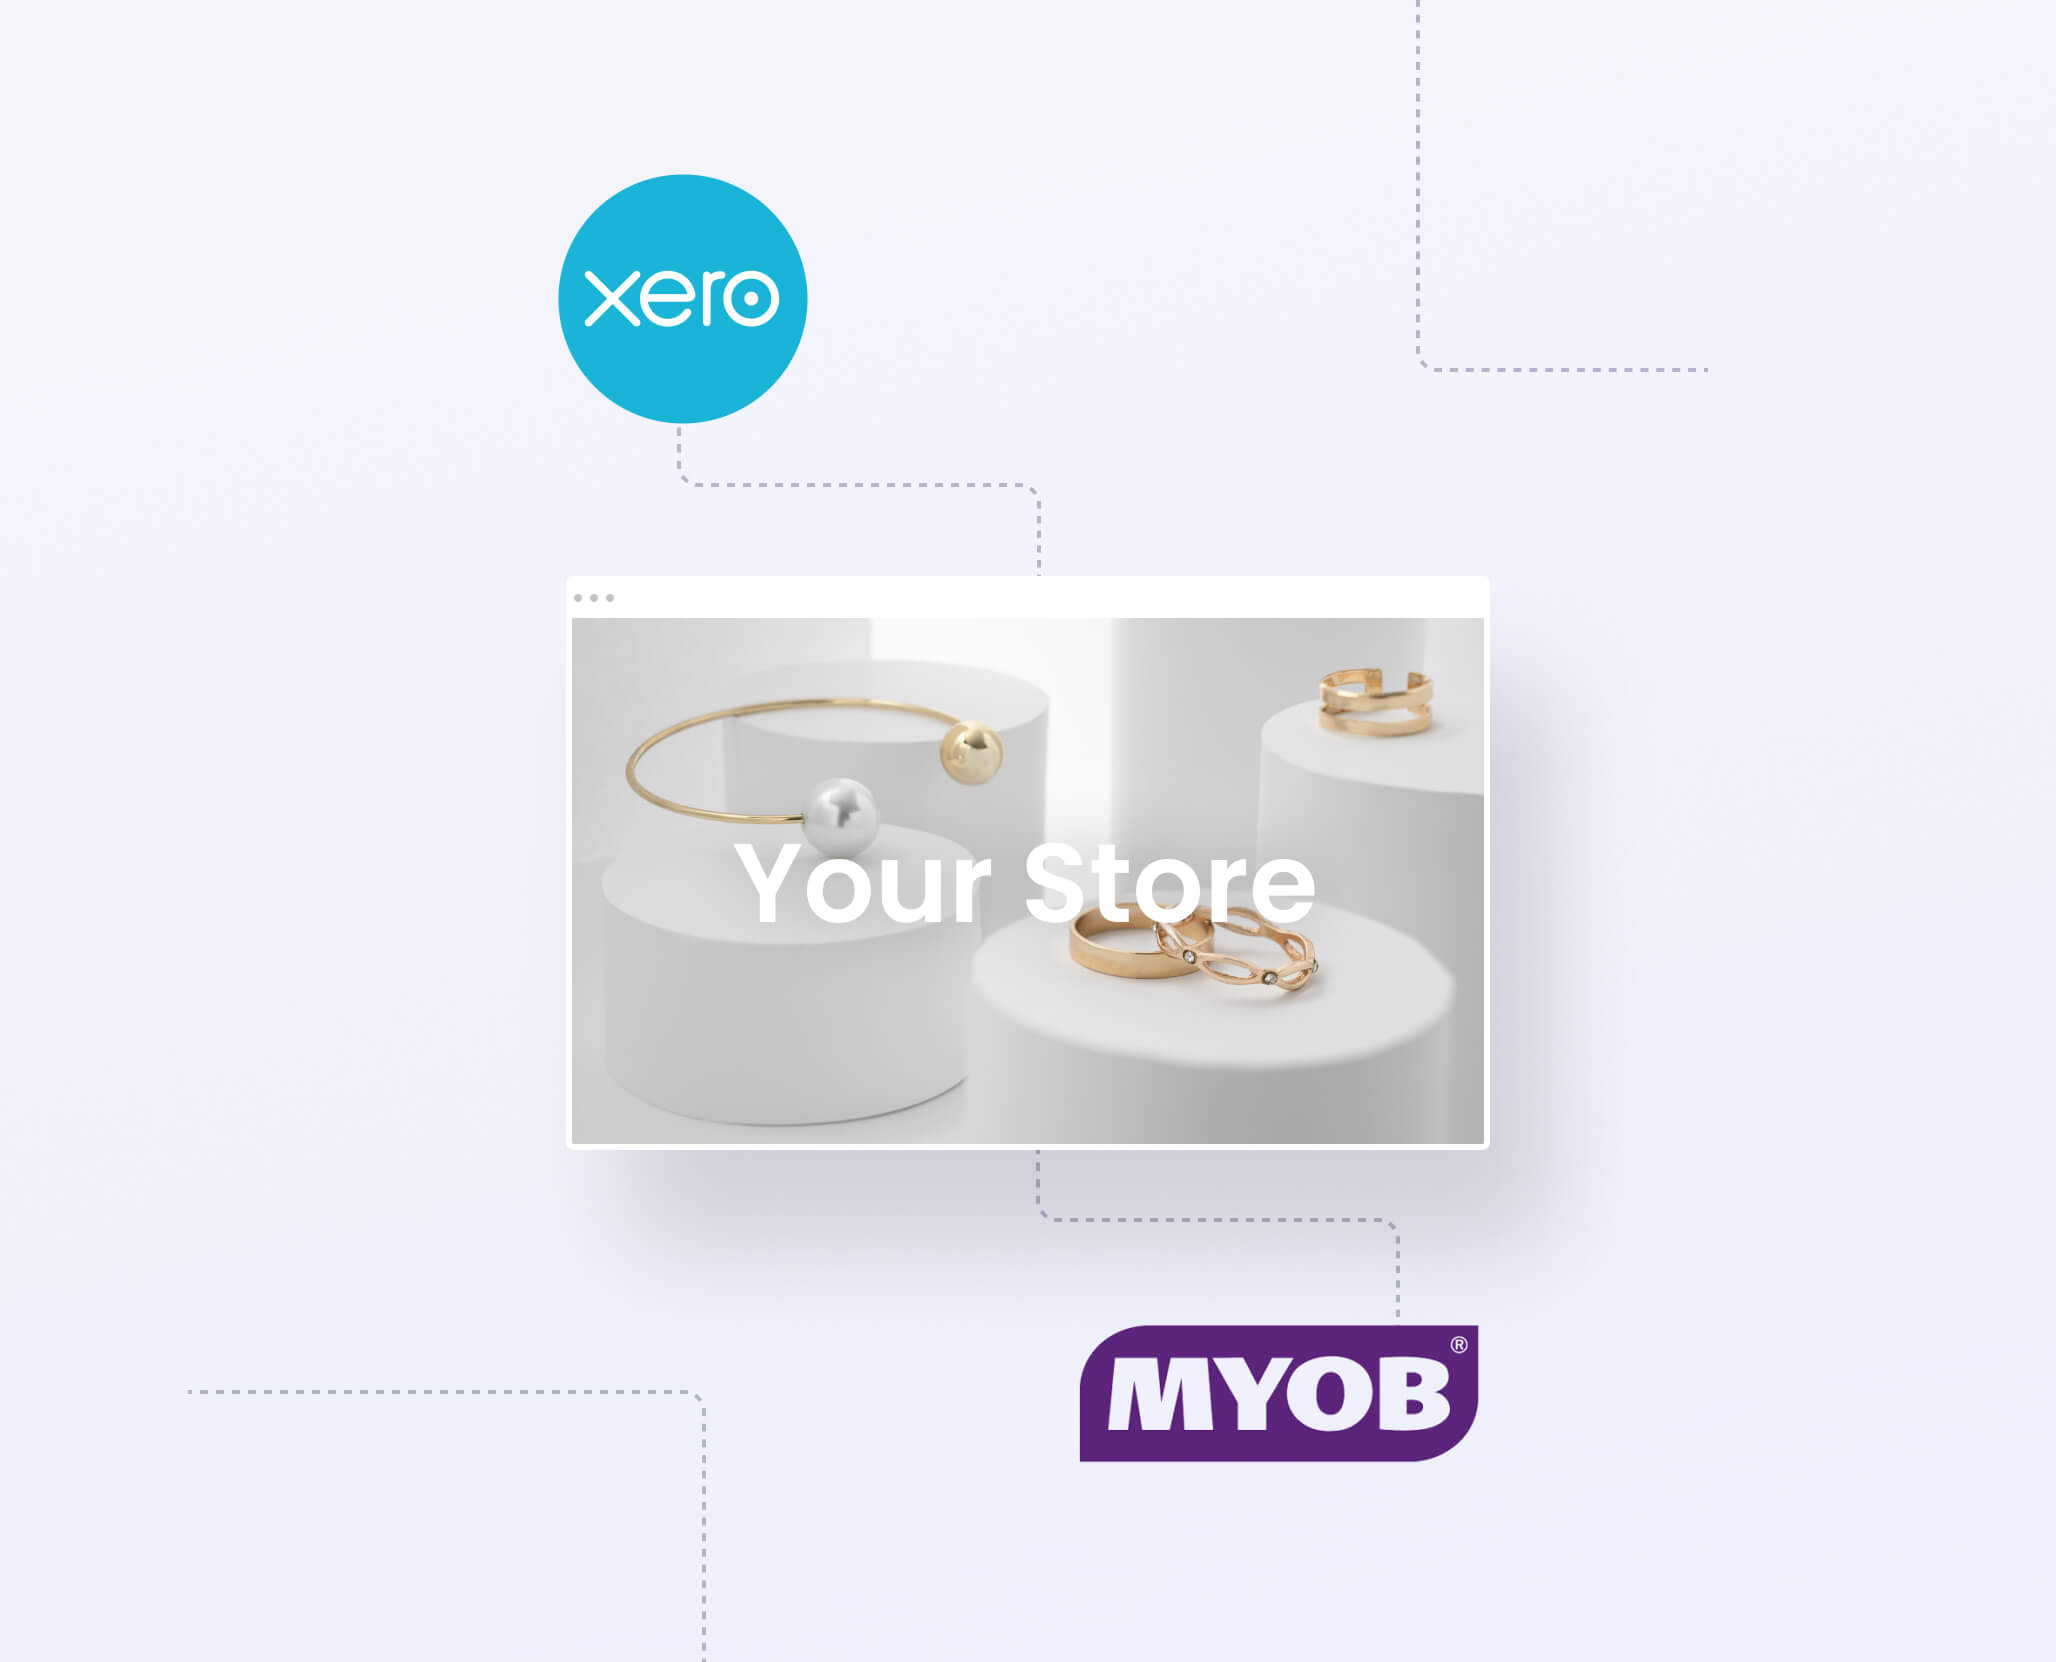 Xero and Myob website integration